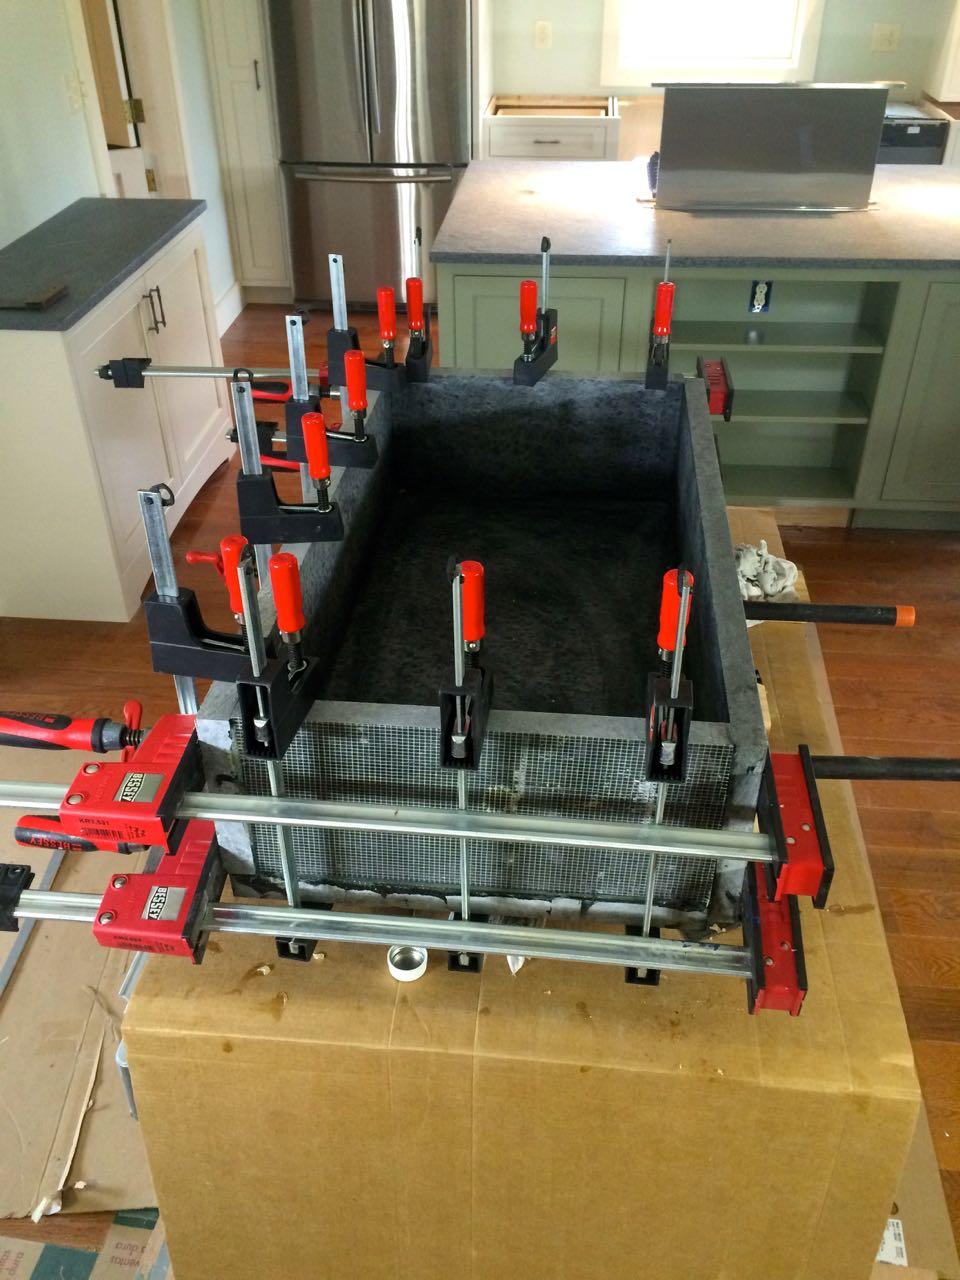 New Soapstone Farm Sink - Kitchens & Baths - Contractor Talk KE81